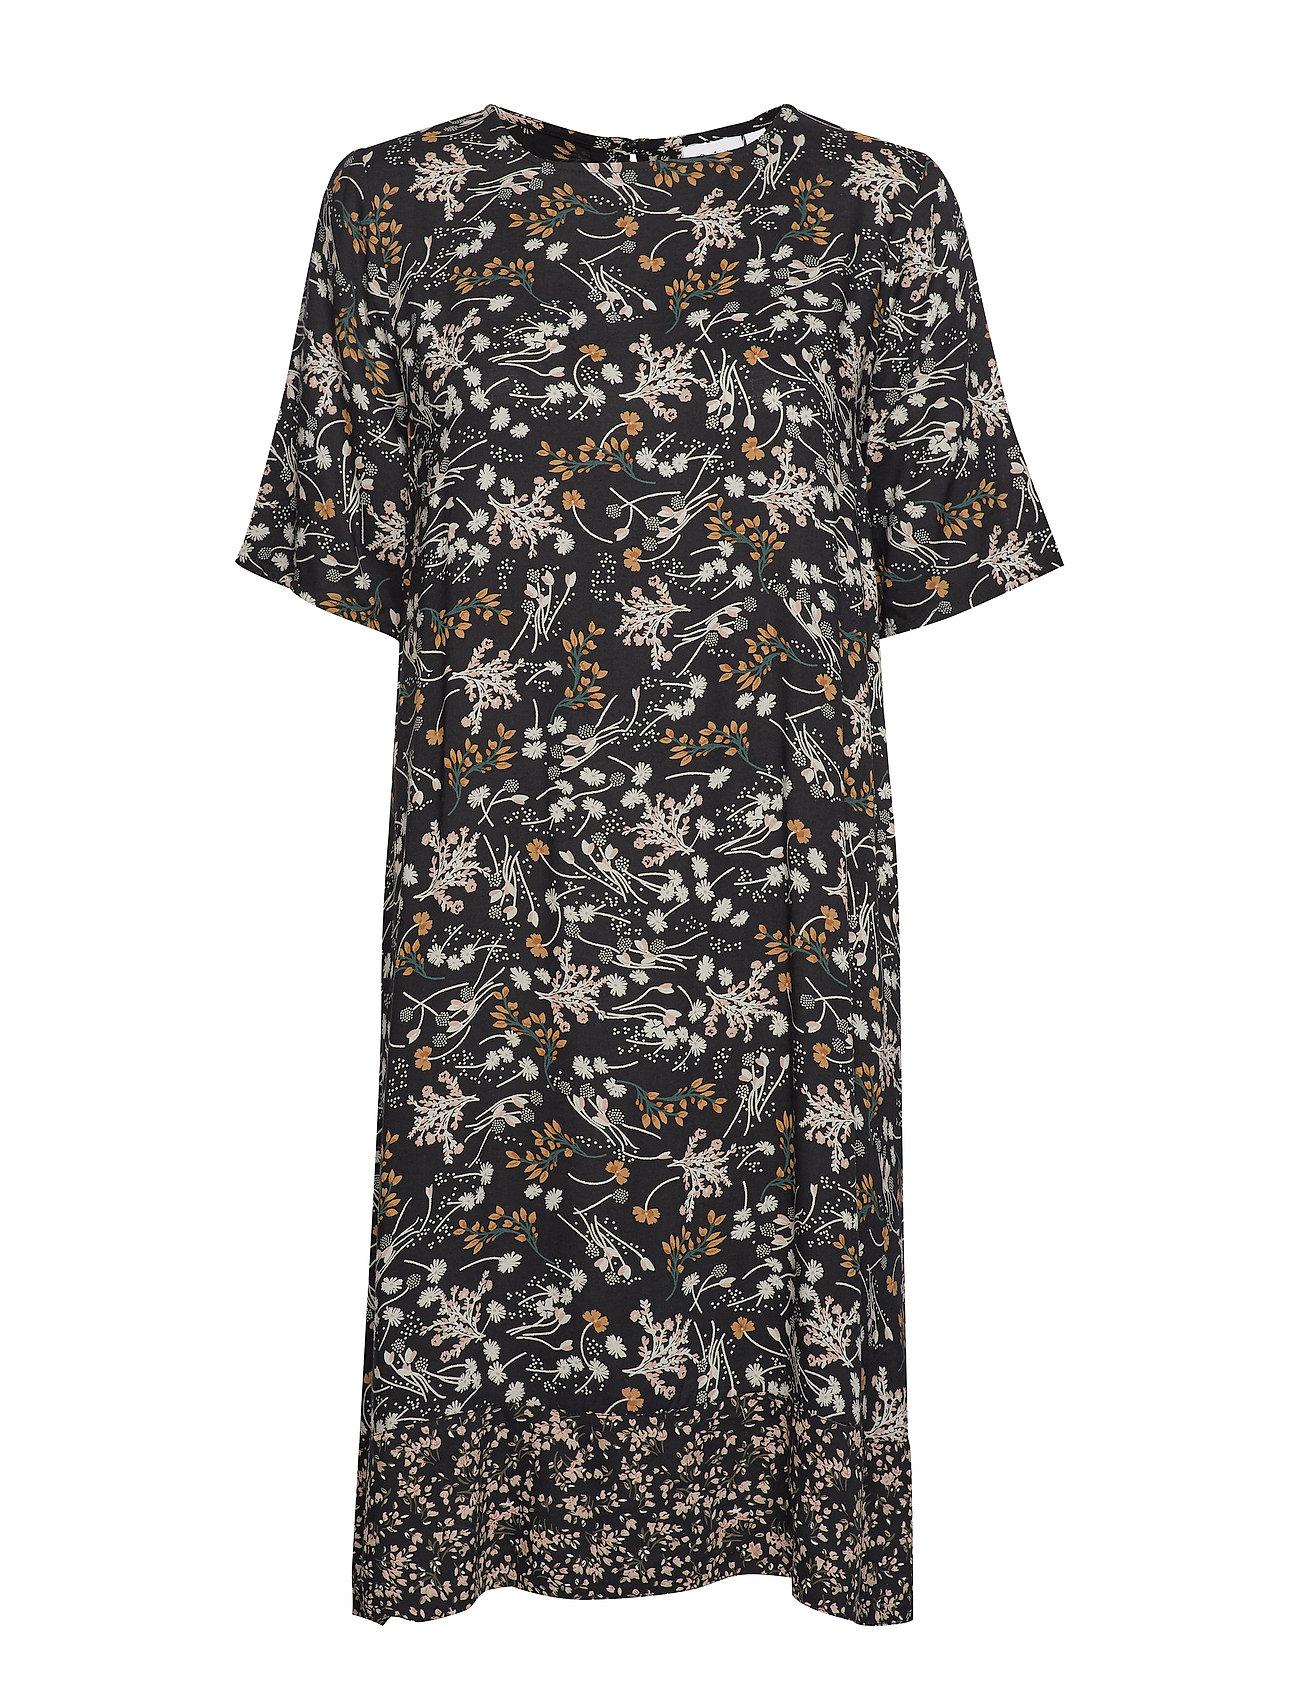 Saint Tropez U6022, WOVEN DRESS ABOVE KNEE - BLACK